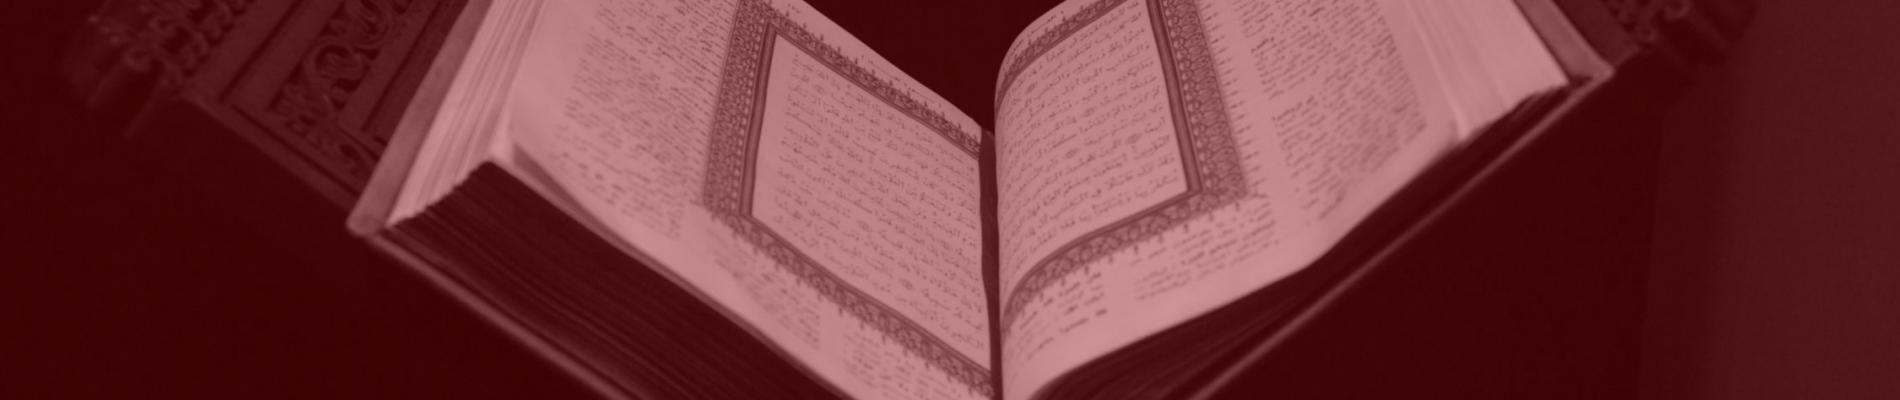 Muhammad Ghouri (CC BY 2.0)